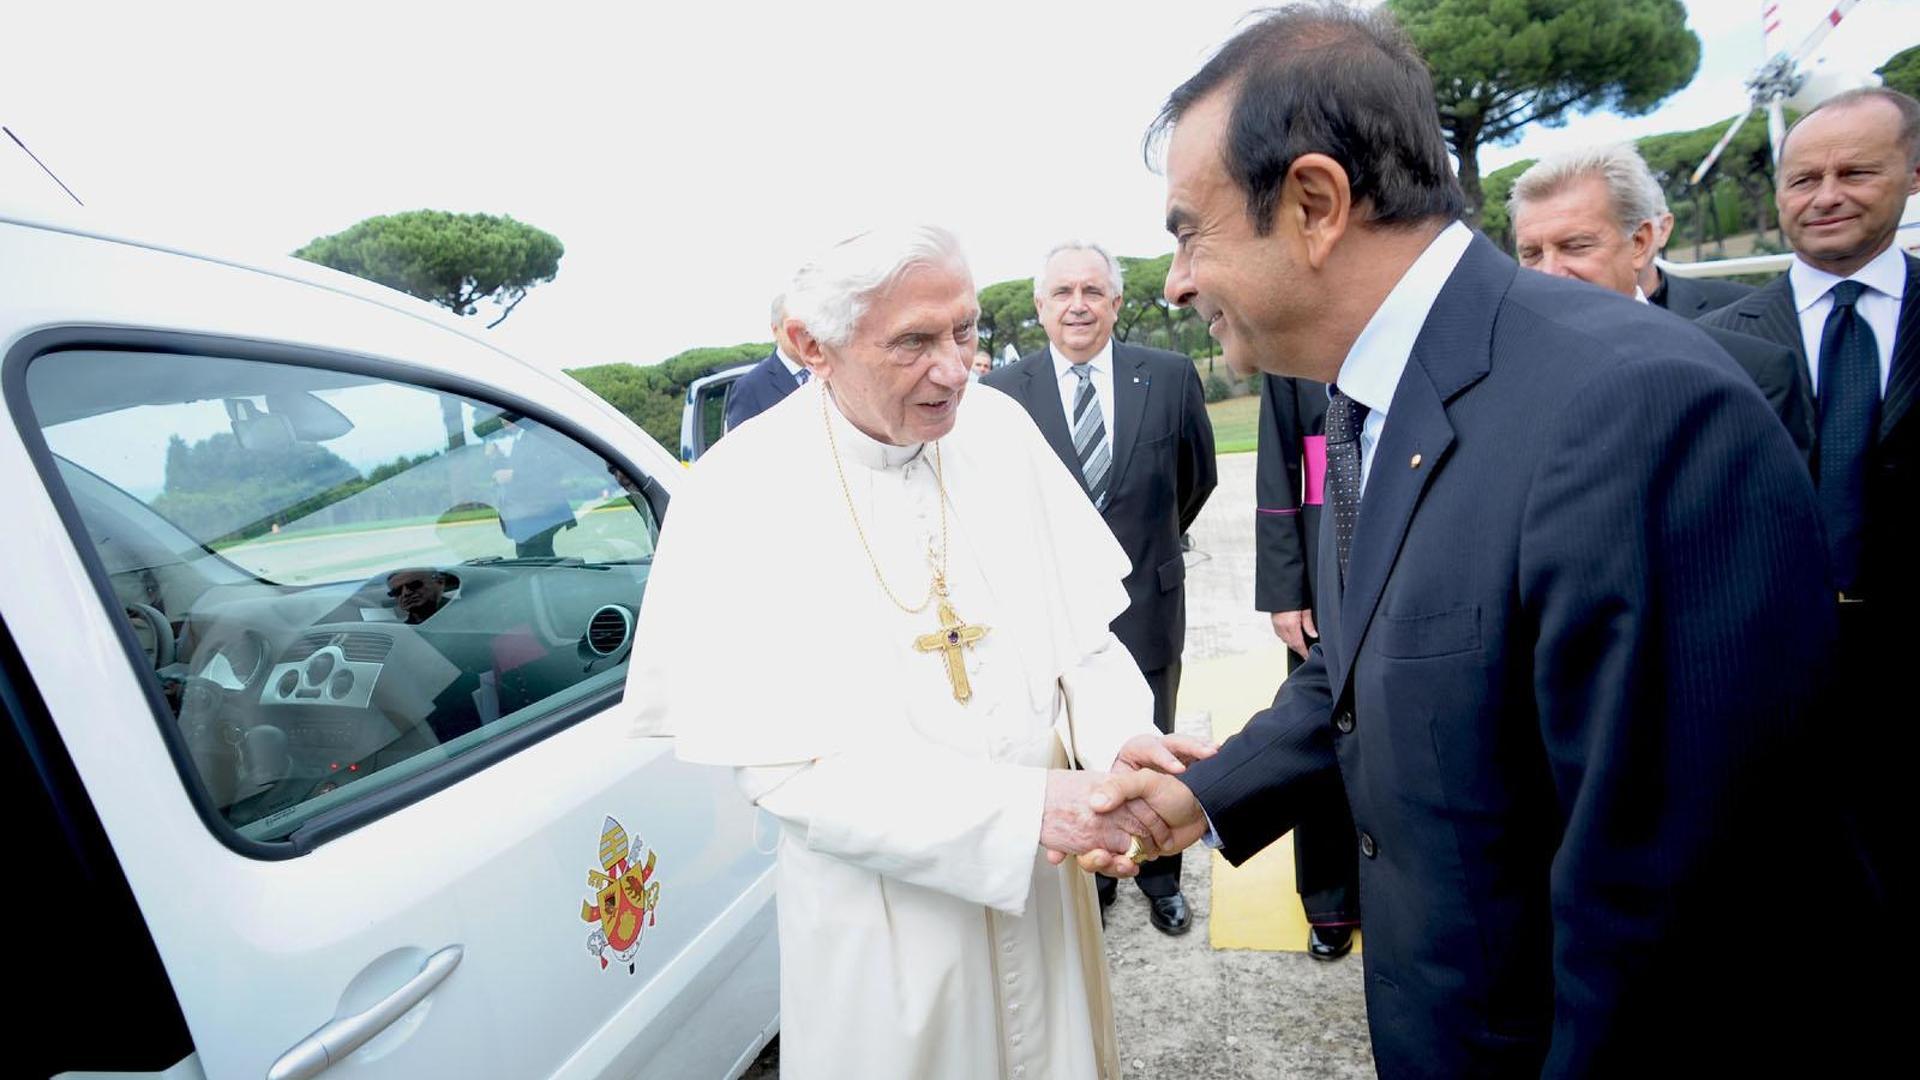 Pope Benedict XVI gets a Kangoo Z.E.